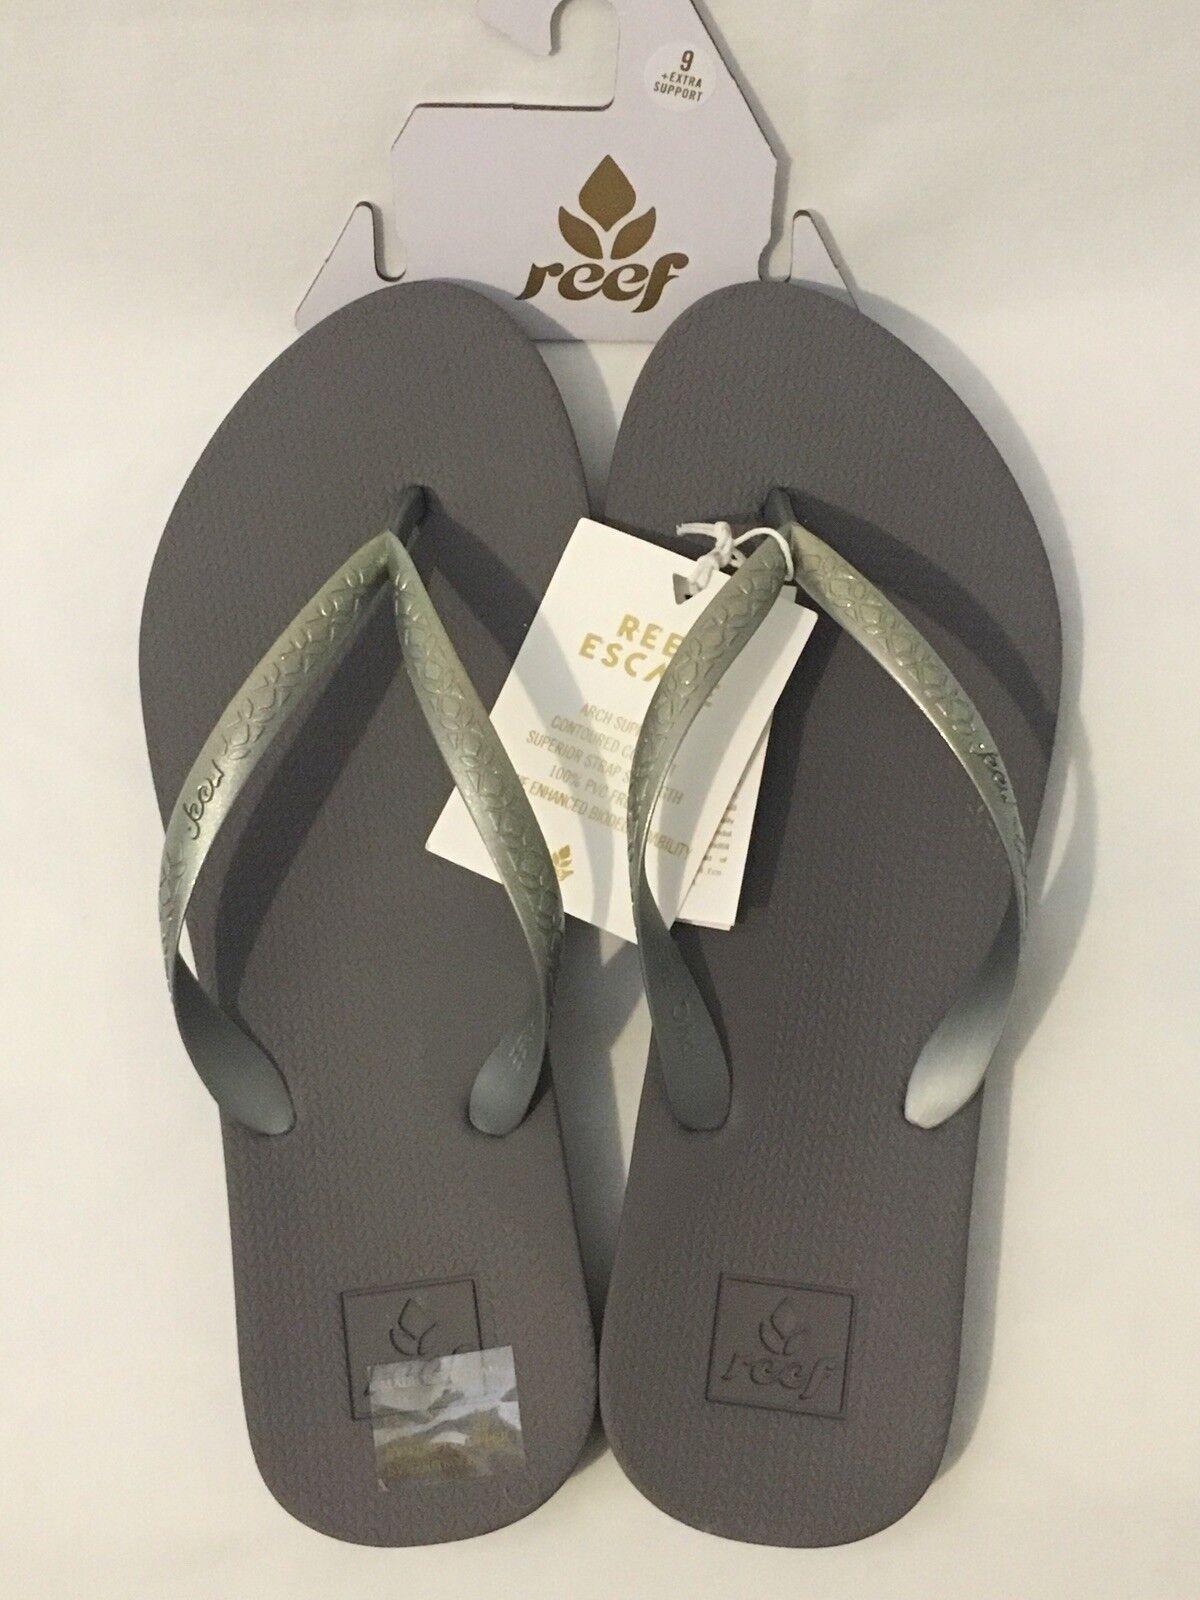 New Sz REEF Escape Lux Iridescent Silver Flip Flops Sandals Sz New 9 EU40 Arch Support 610853